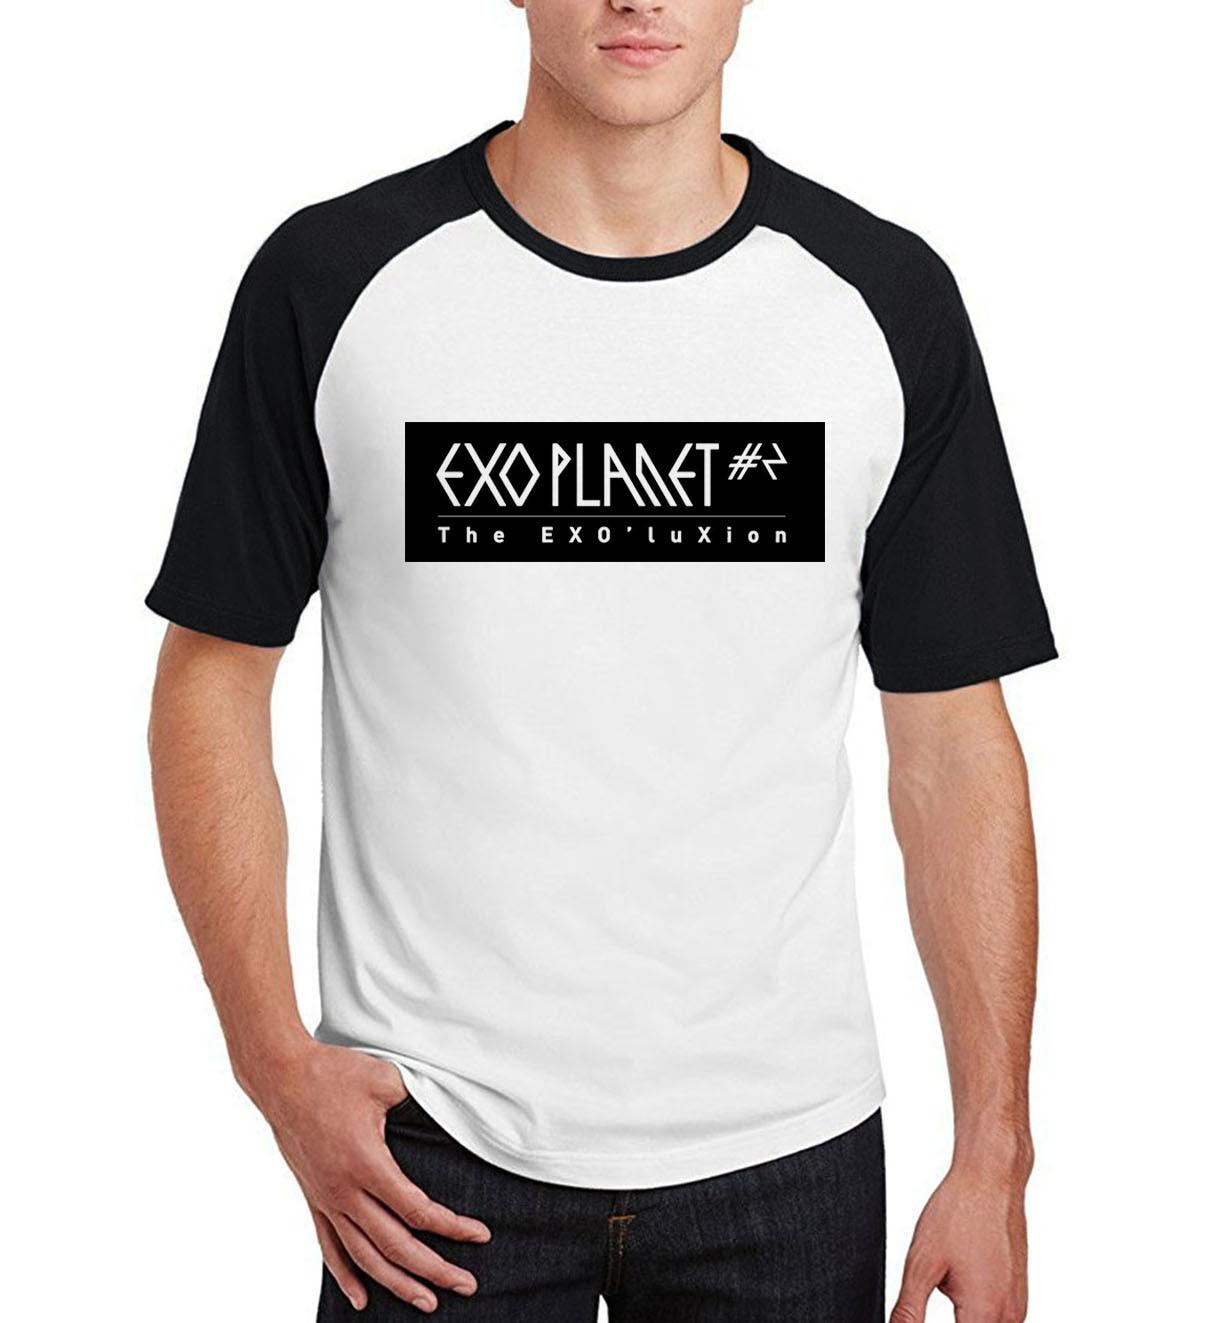 fashion cotton short sleeve raglan t-shirt 2019 summer  Star The Same harajuku camisetas men harajuku brand clothing mma top